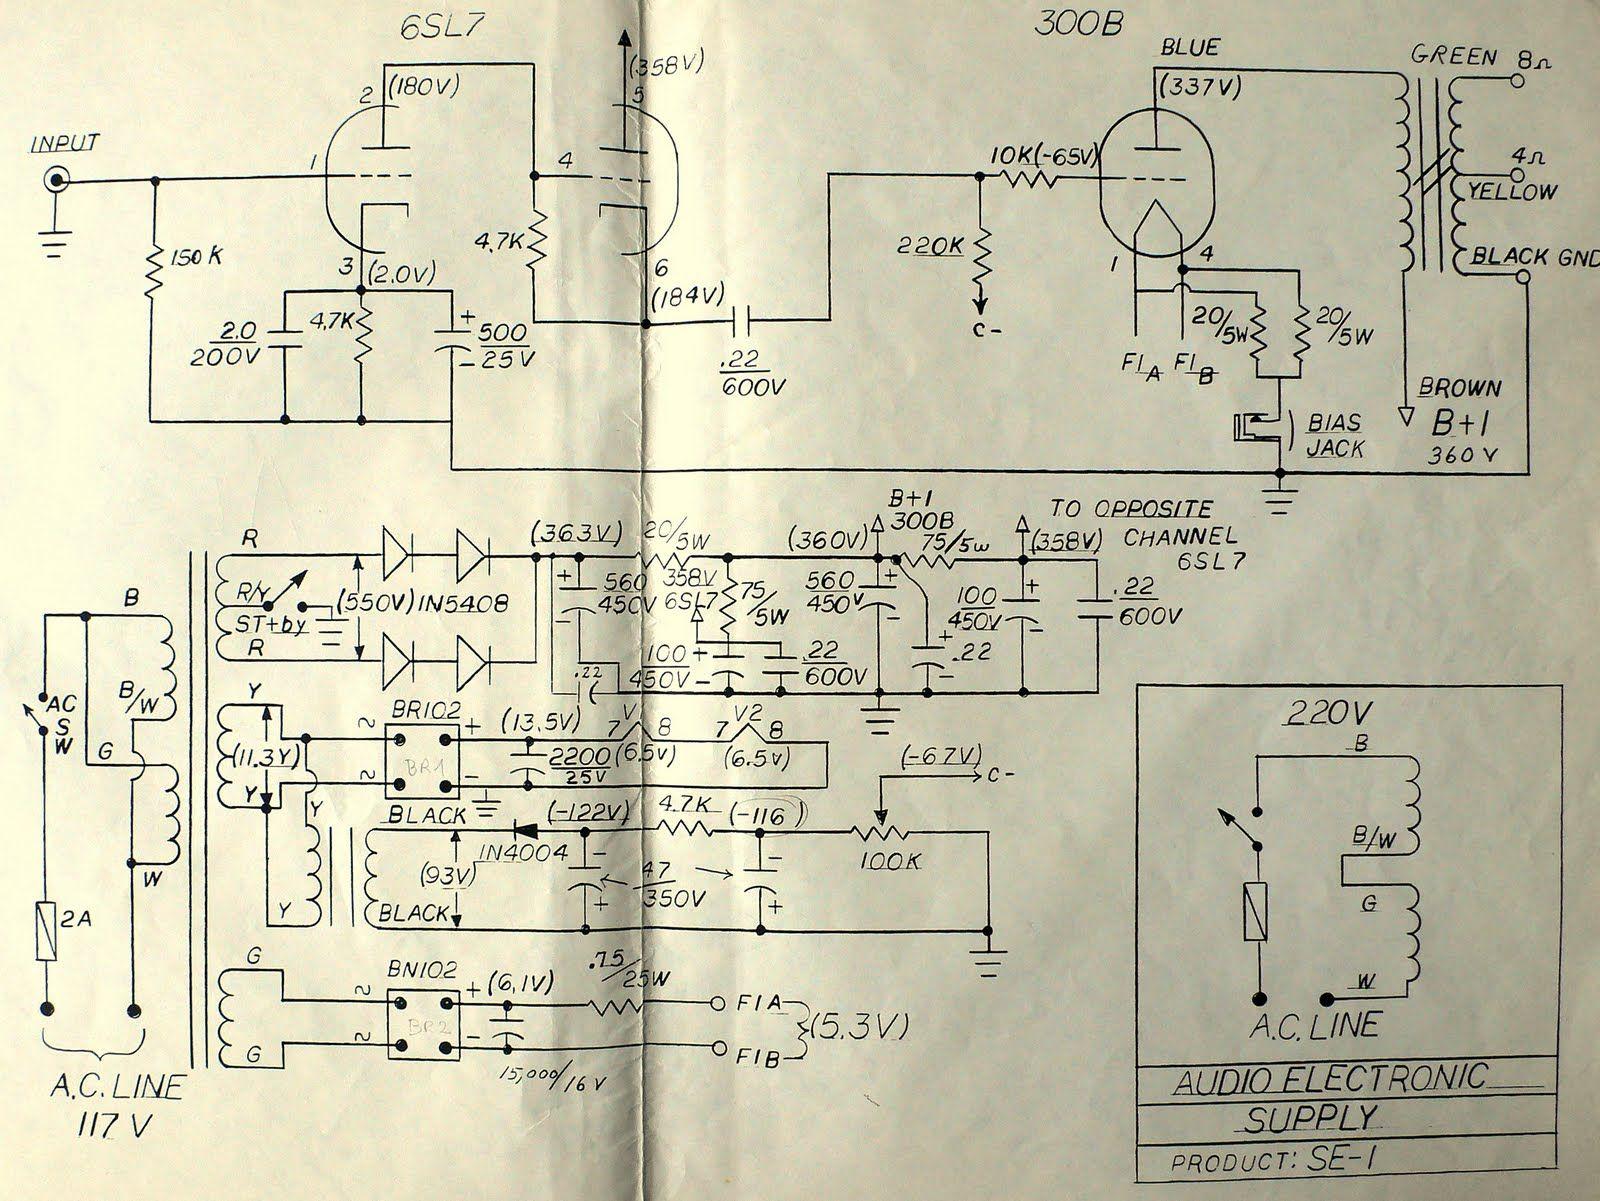 cary slp 98 schematic